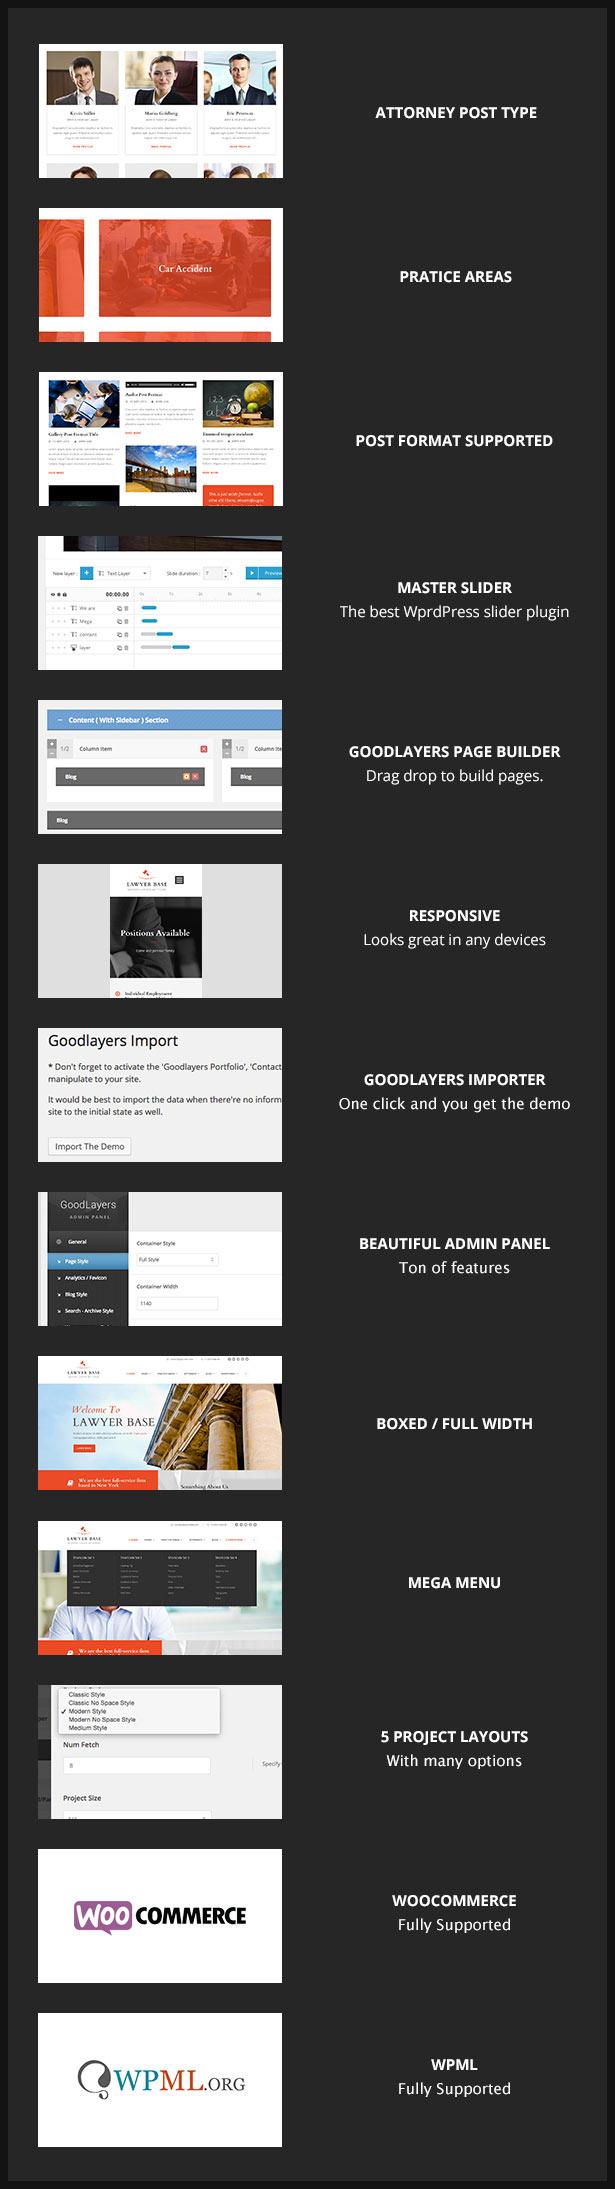 screen 1 - Lawyer Base - Attorney WordPress